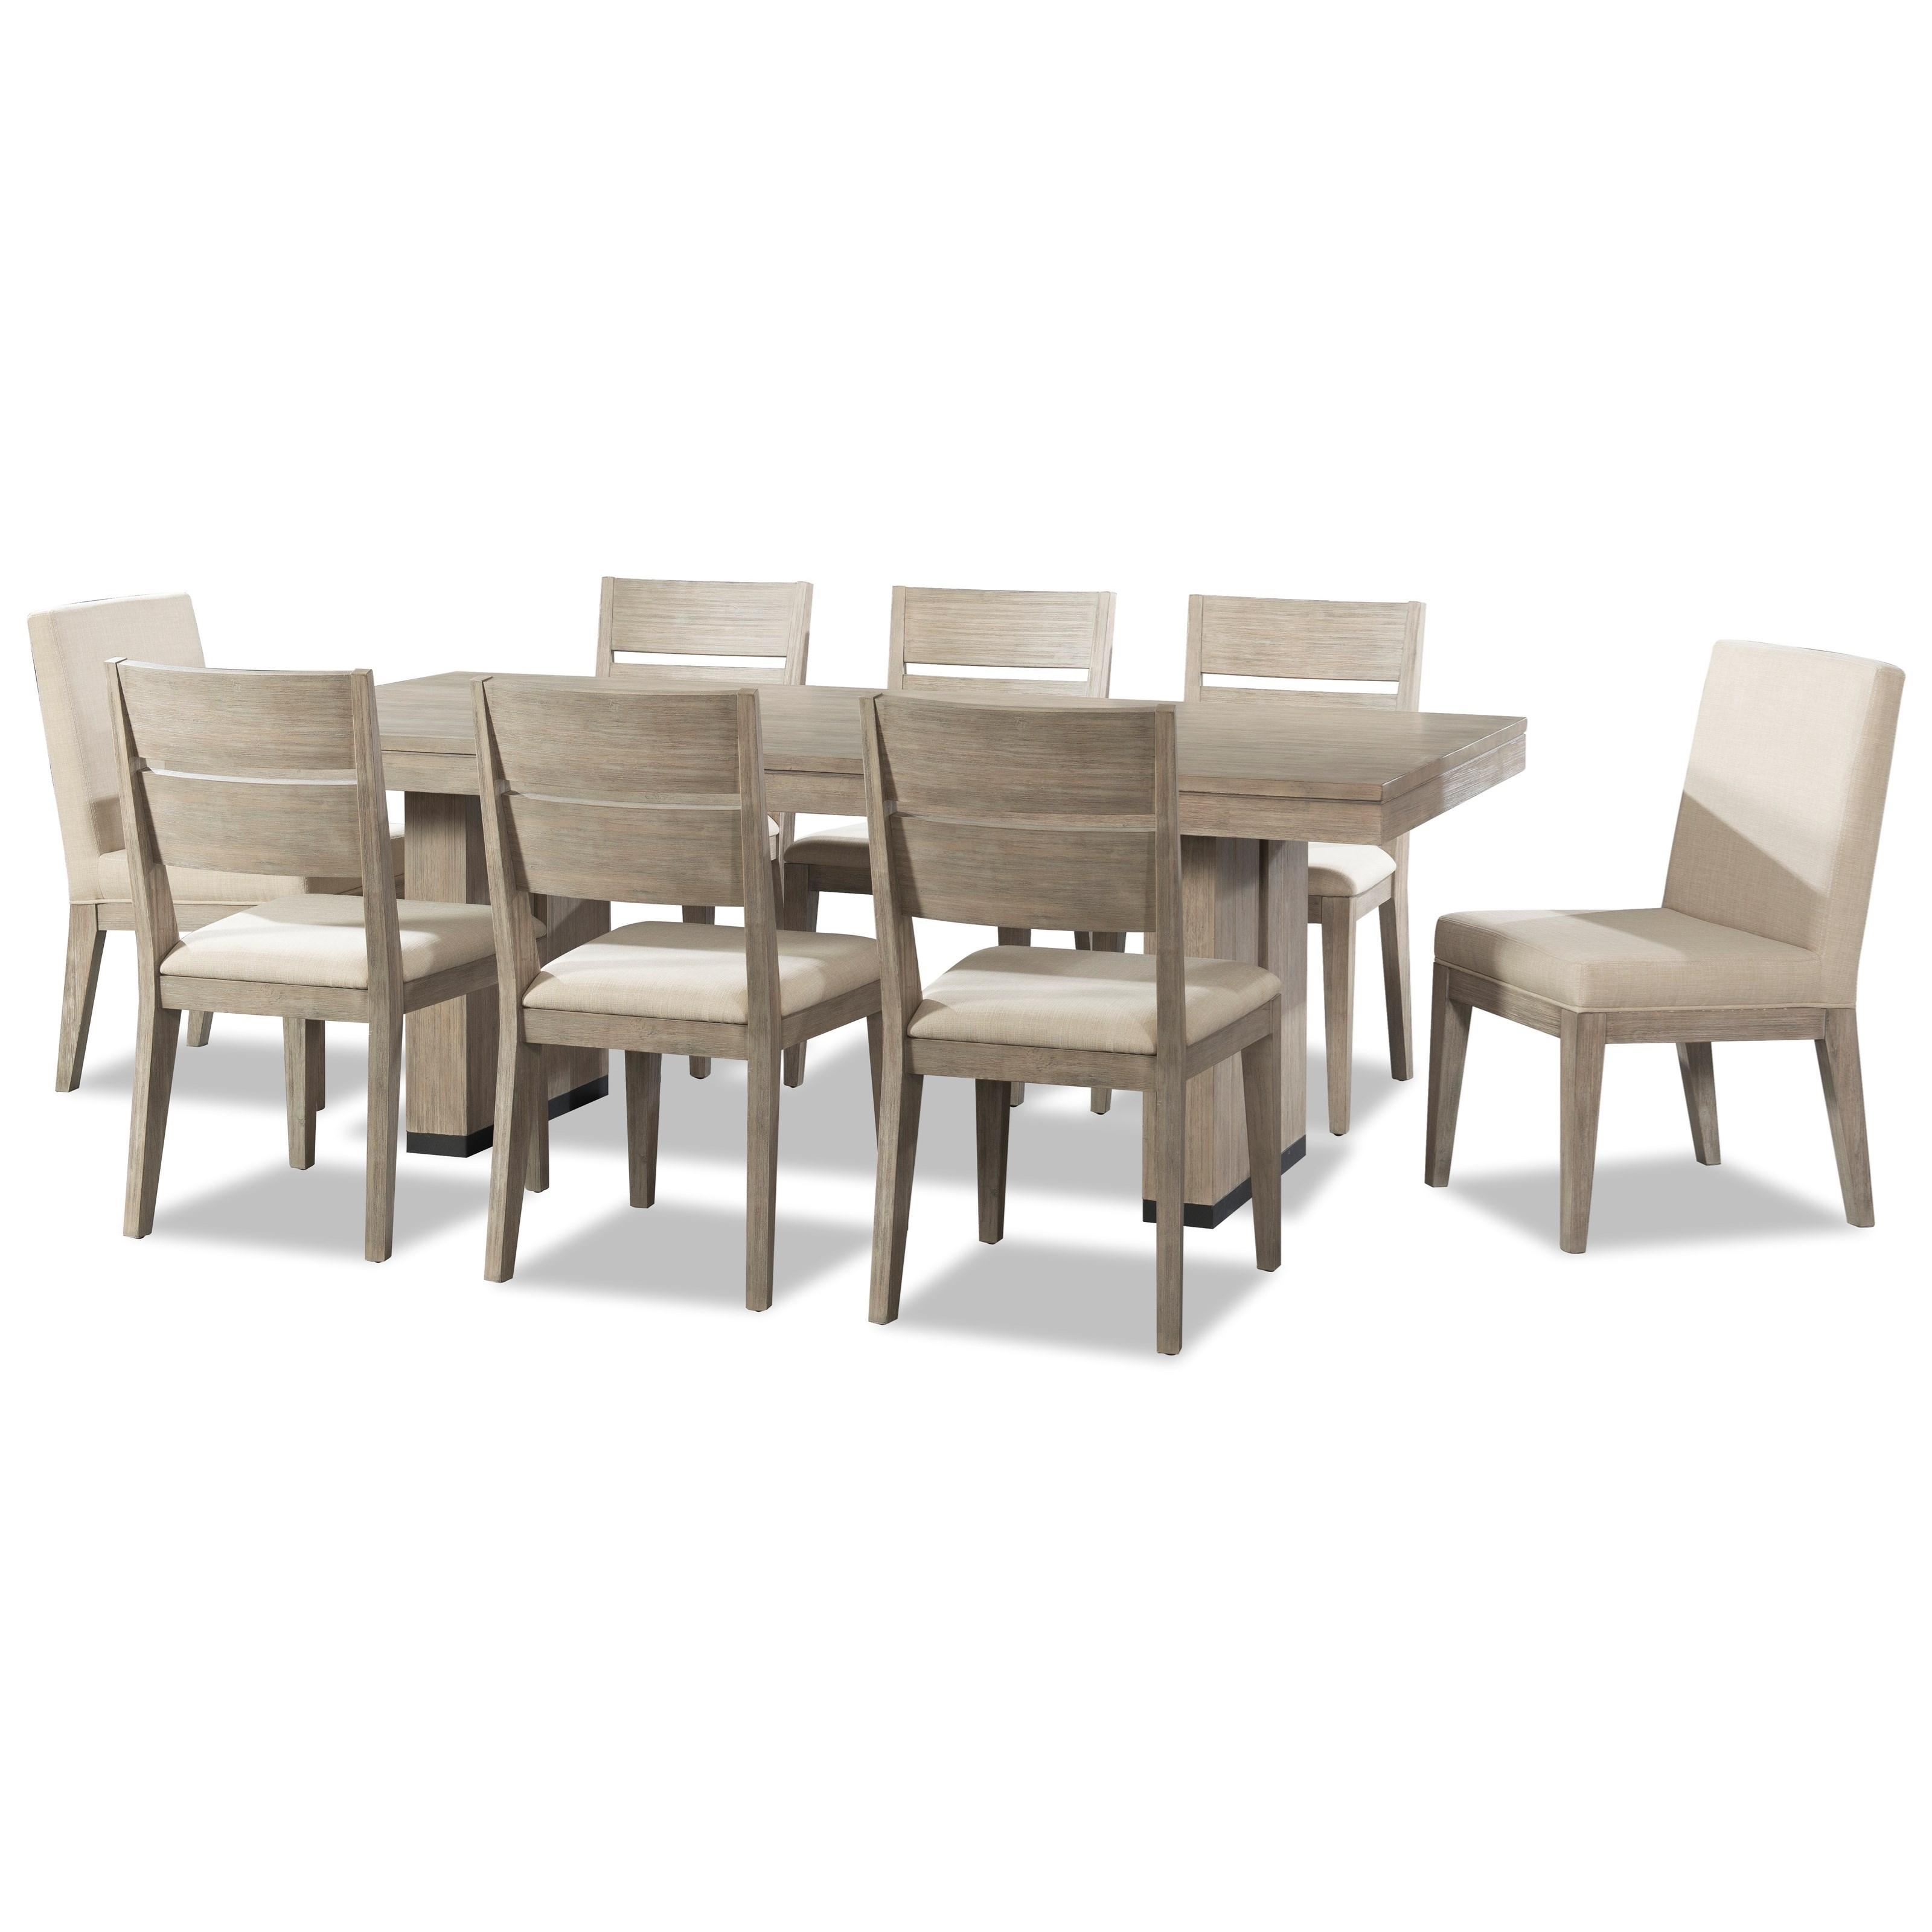 Cresent Fine Furniture Larkspur 9 Piece Trestle Table and  : products2Fcresentfinefurniture2Fcolor2Flarkspur20503503 1502B2x1572B6x158 b1 from www.belfortfurniture.com size 3200 x 3200 jpeg 656kB